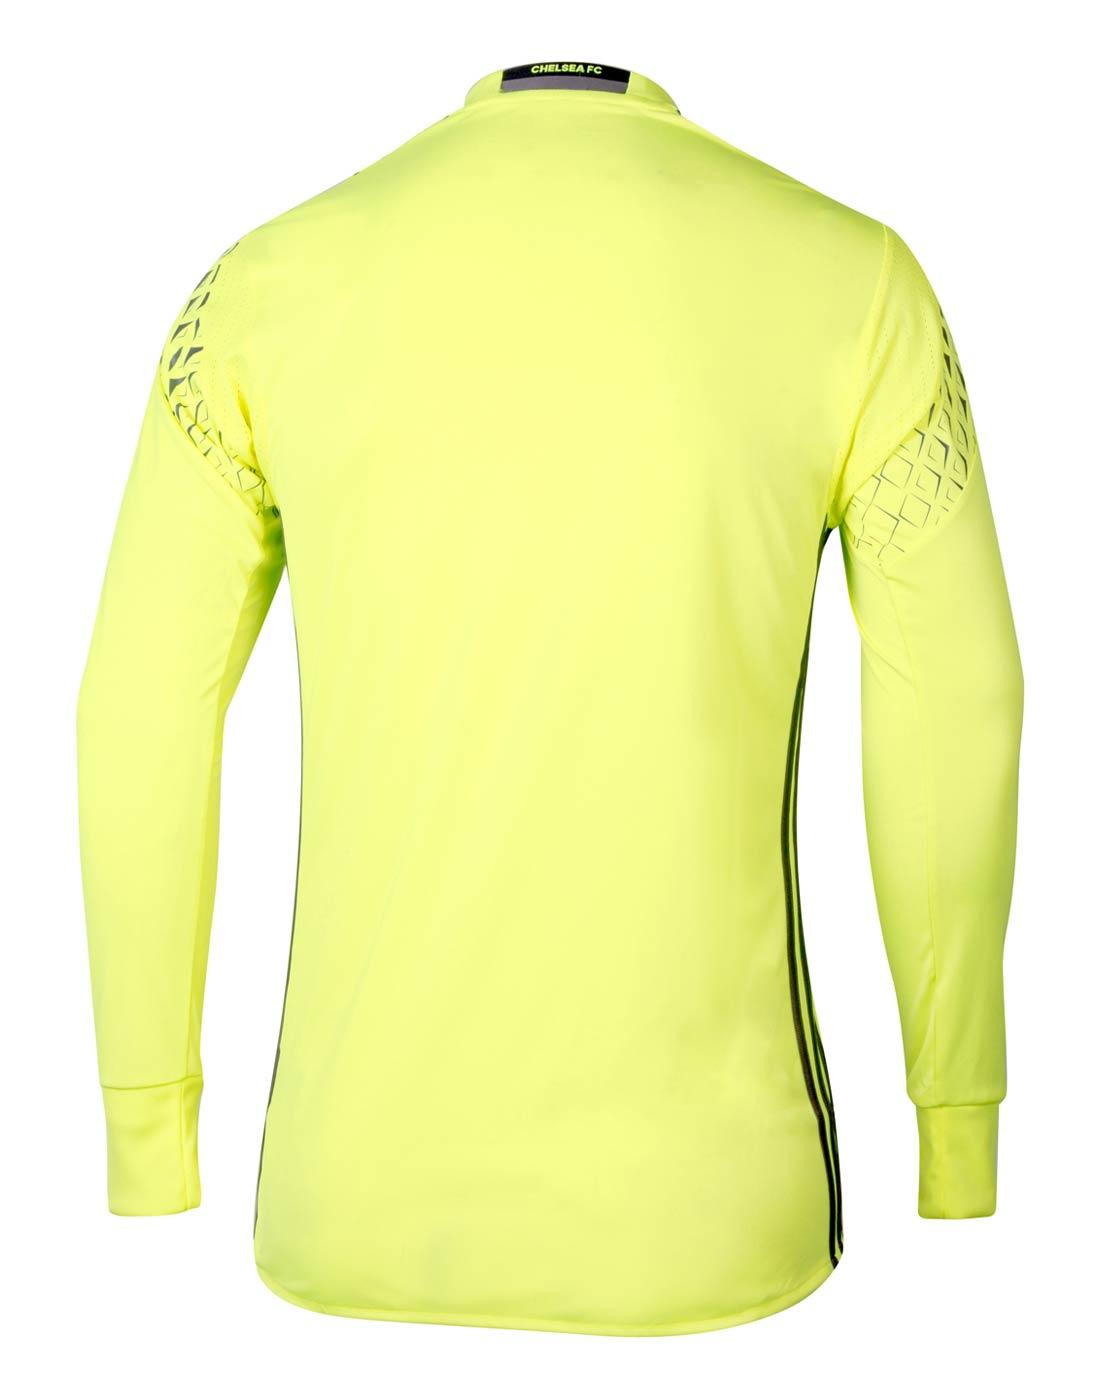 cc9b15918 adidas Adult Chelsea Goalkeeper Jersey